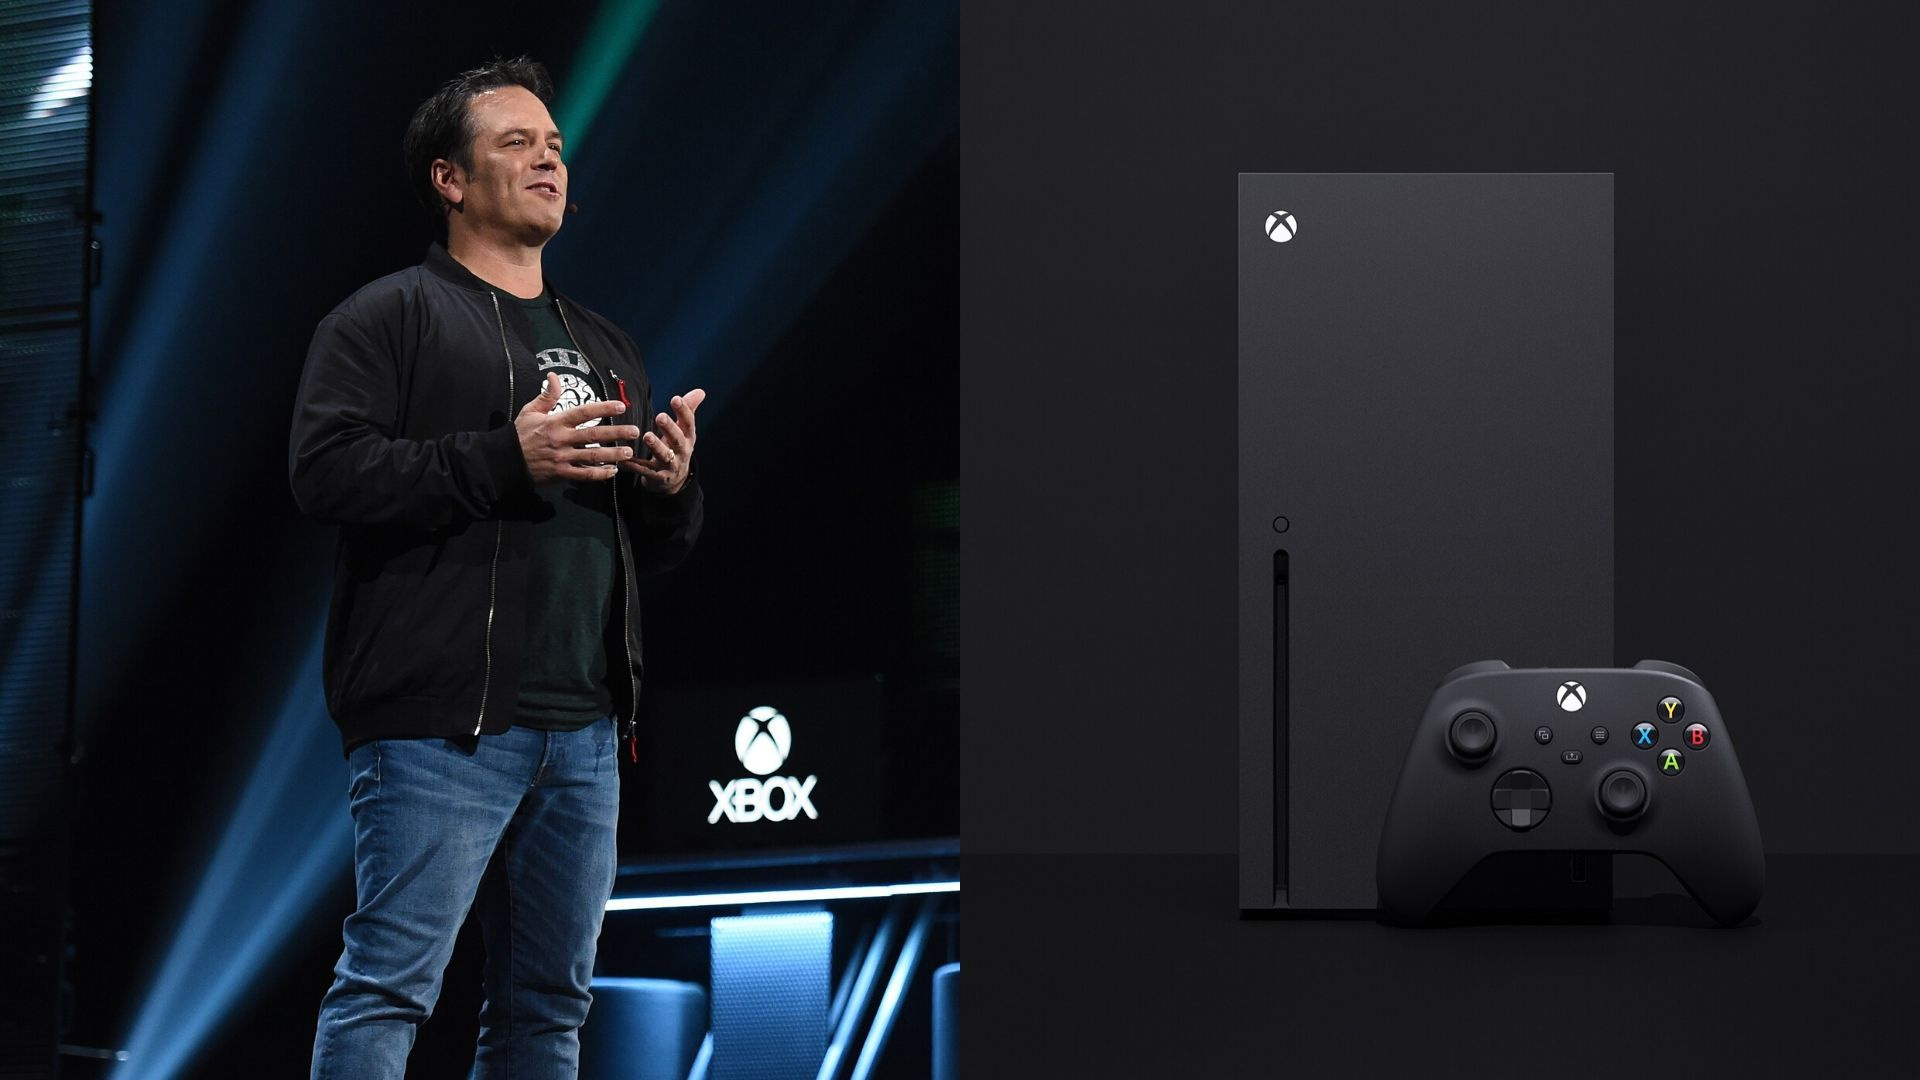 Xbox总监:我们第一方游戏会很有吸引力 不用学索尼的策略